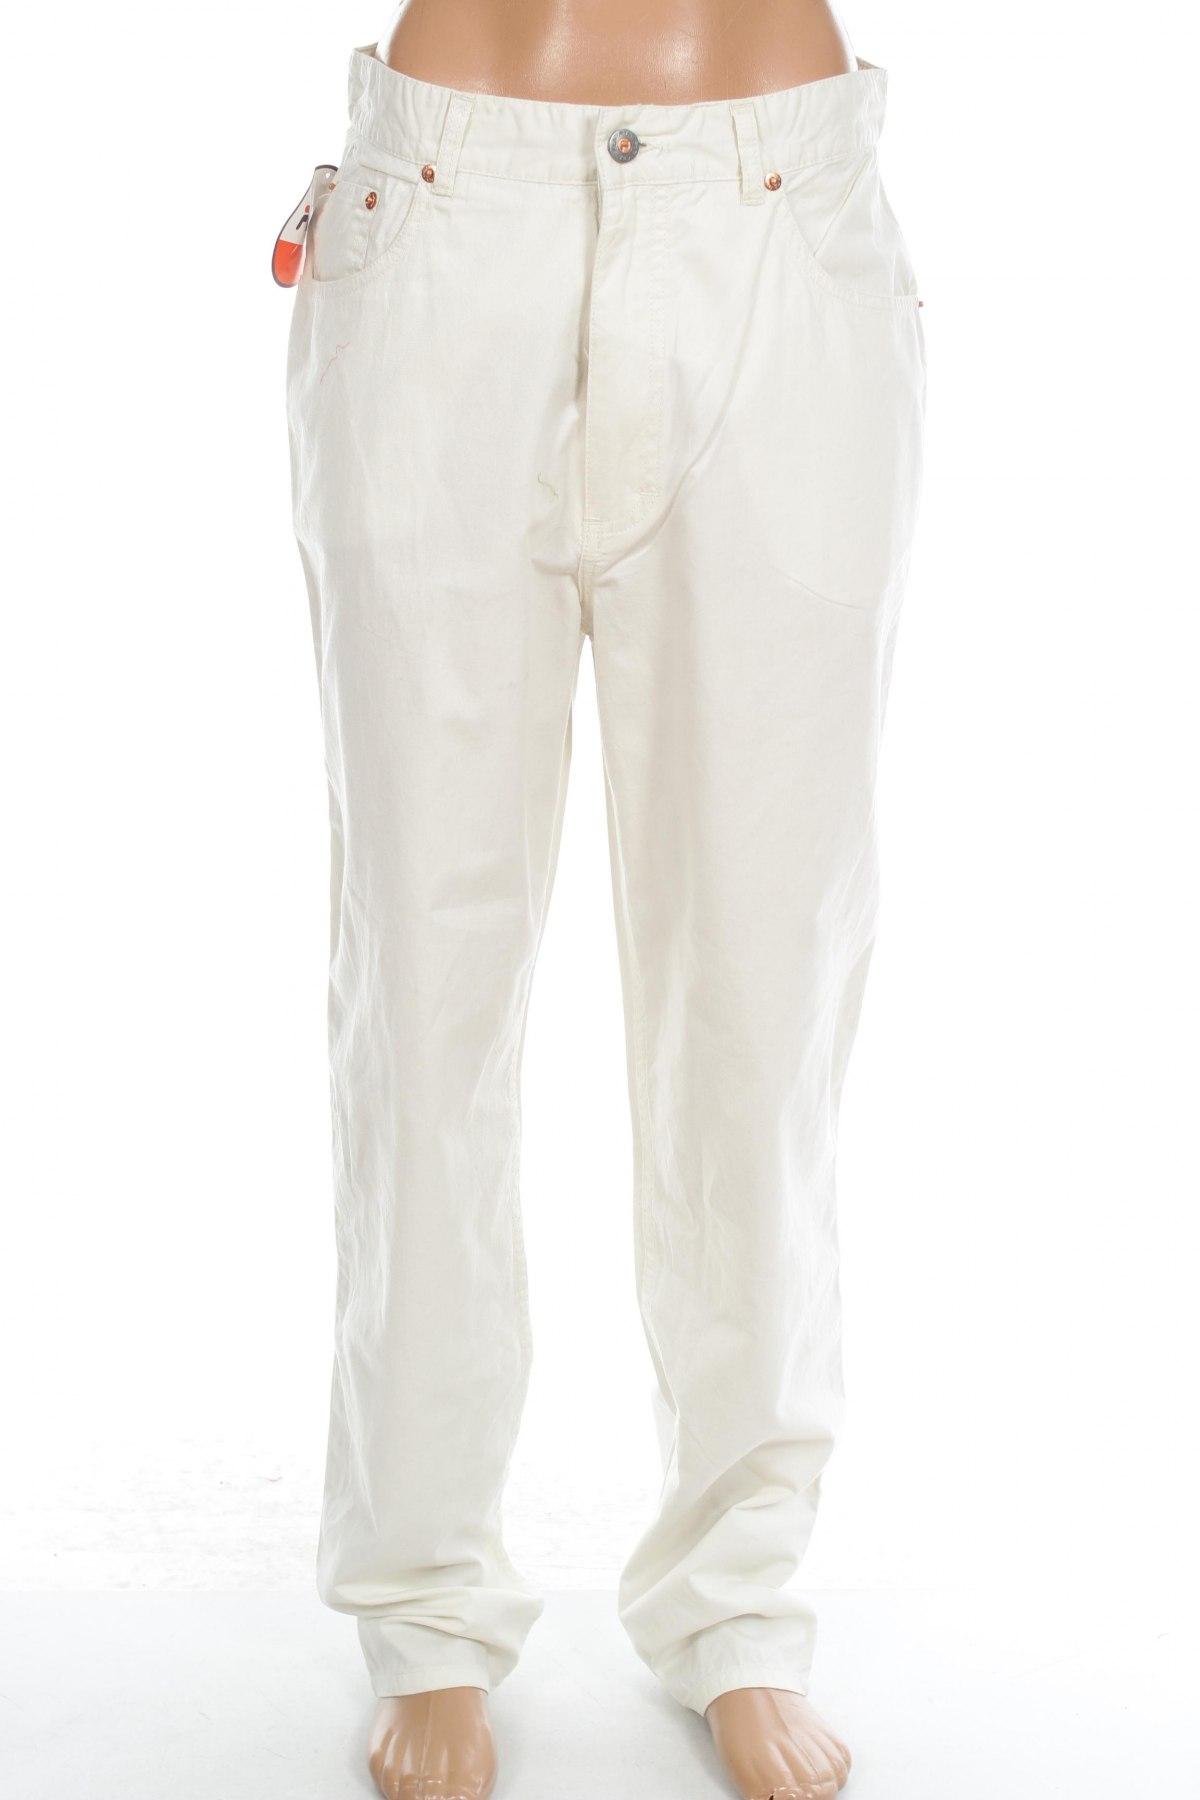 b36f1668cb013 Pánske nohavice Fila - za výhodnú cenu na Remix - #102197295